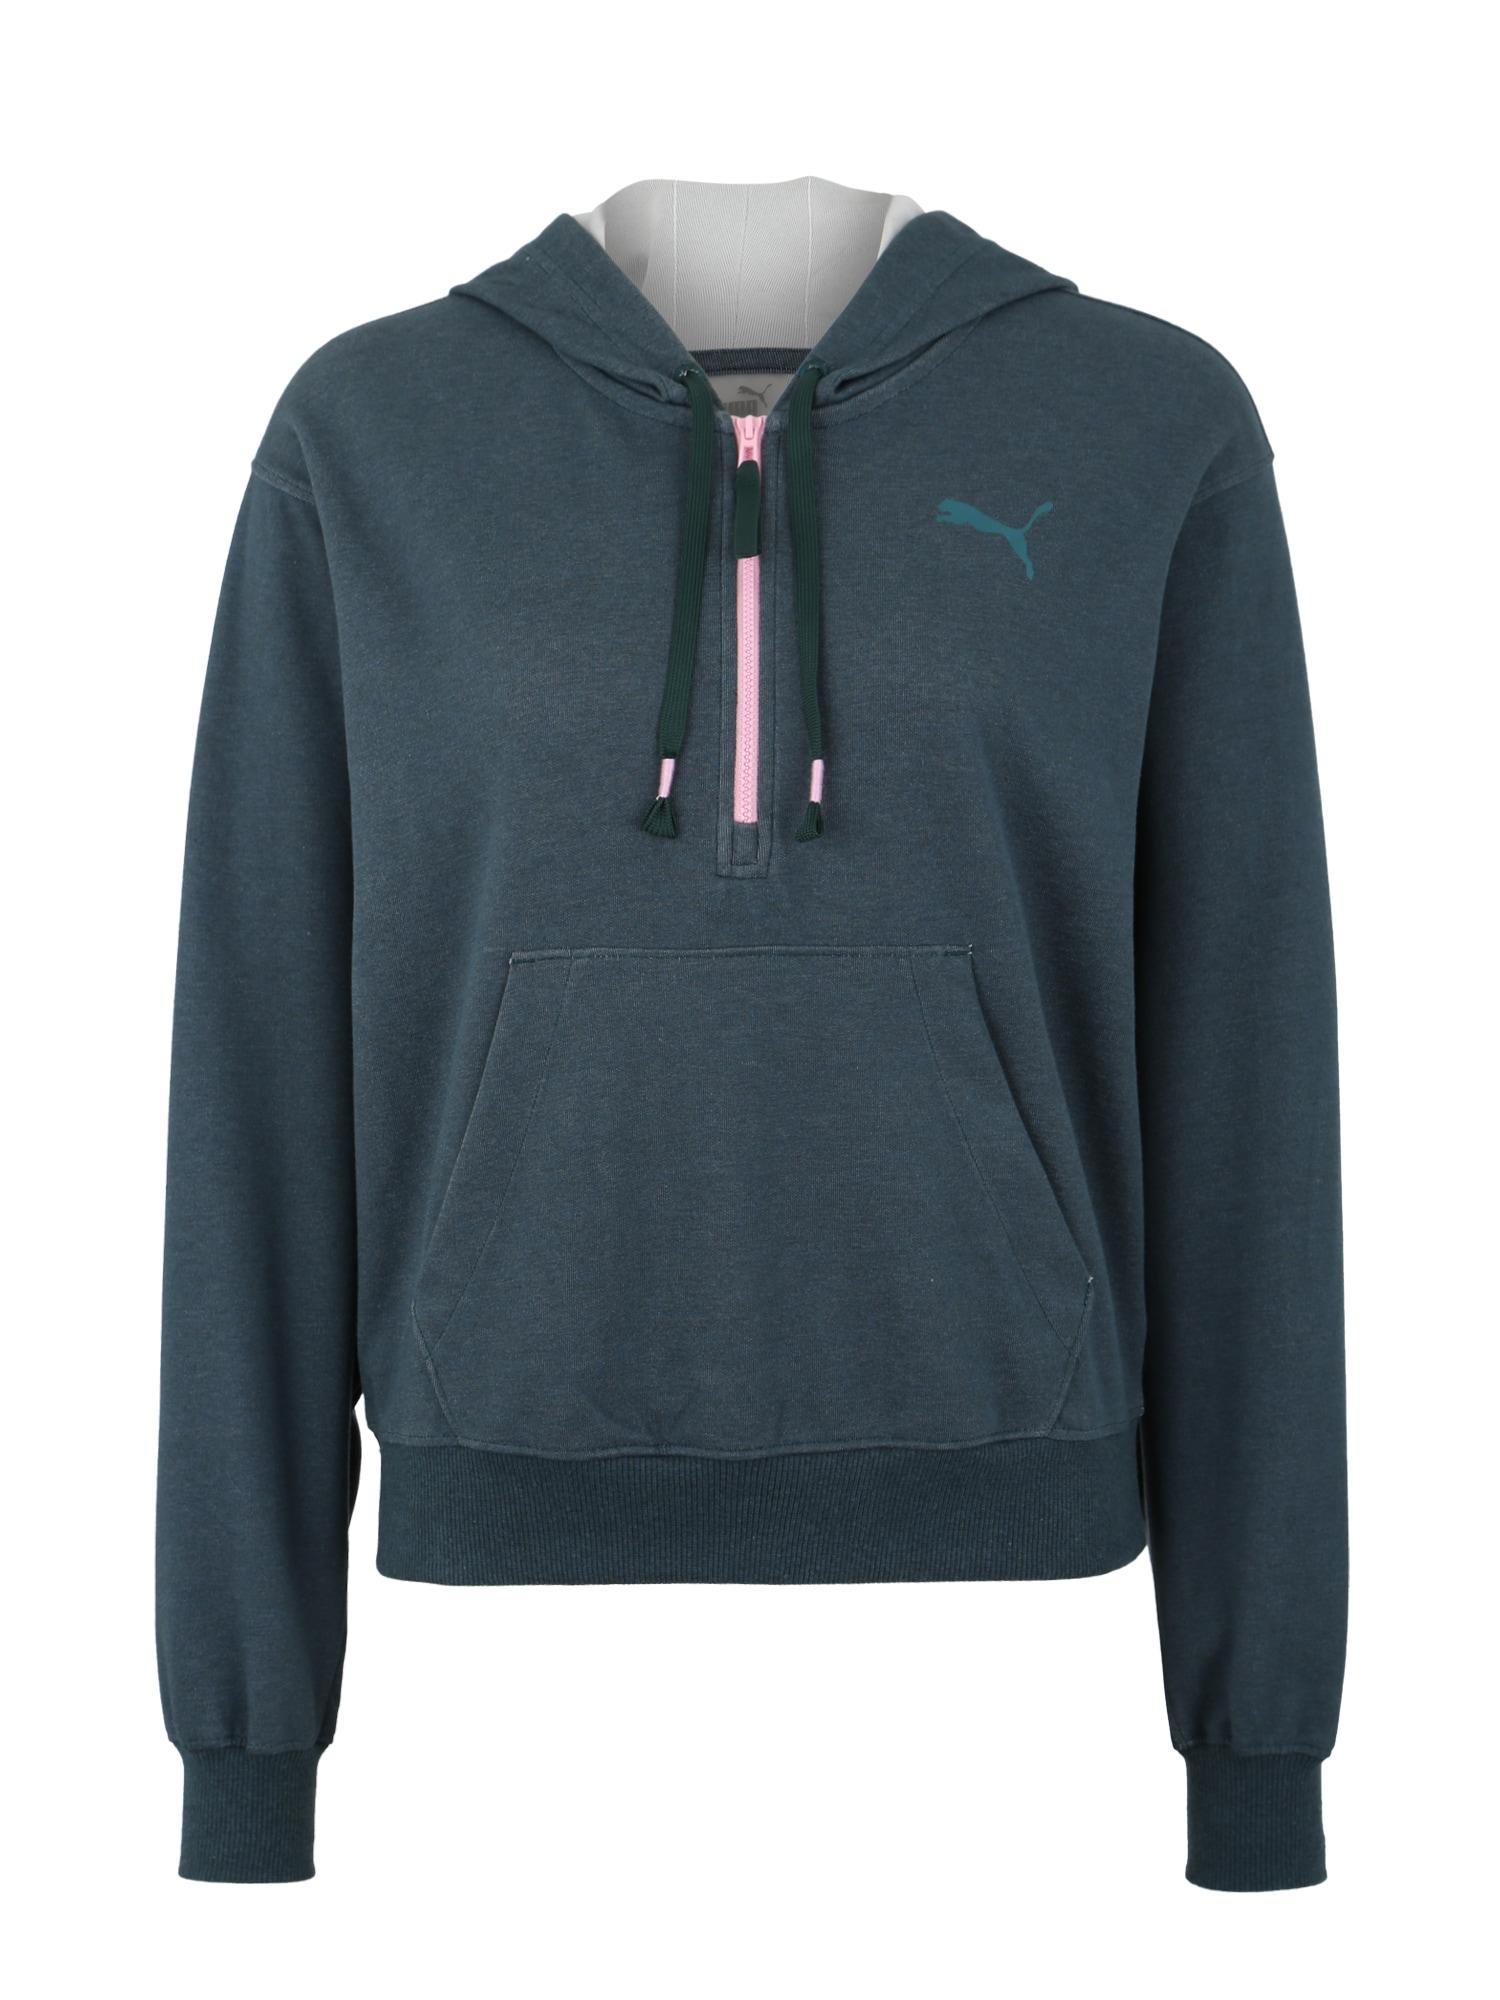 Sweatshirt 'Feel It Cover up' | Bekleidung > Sweatshirts & -jacken > Sweatshirts | Puma